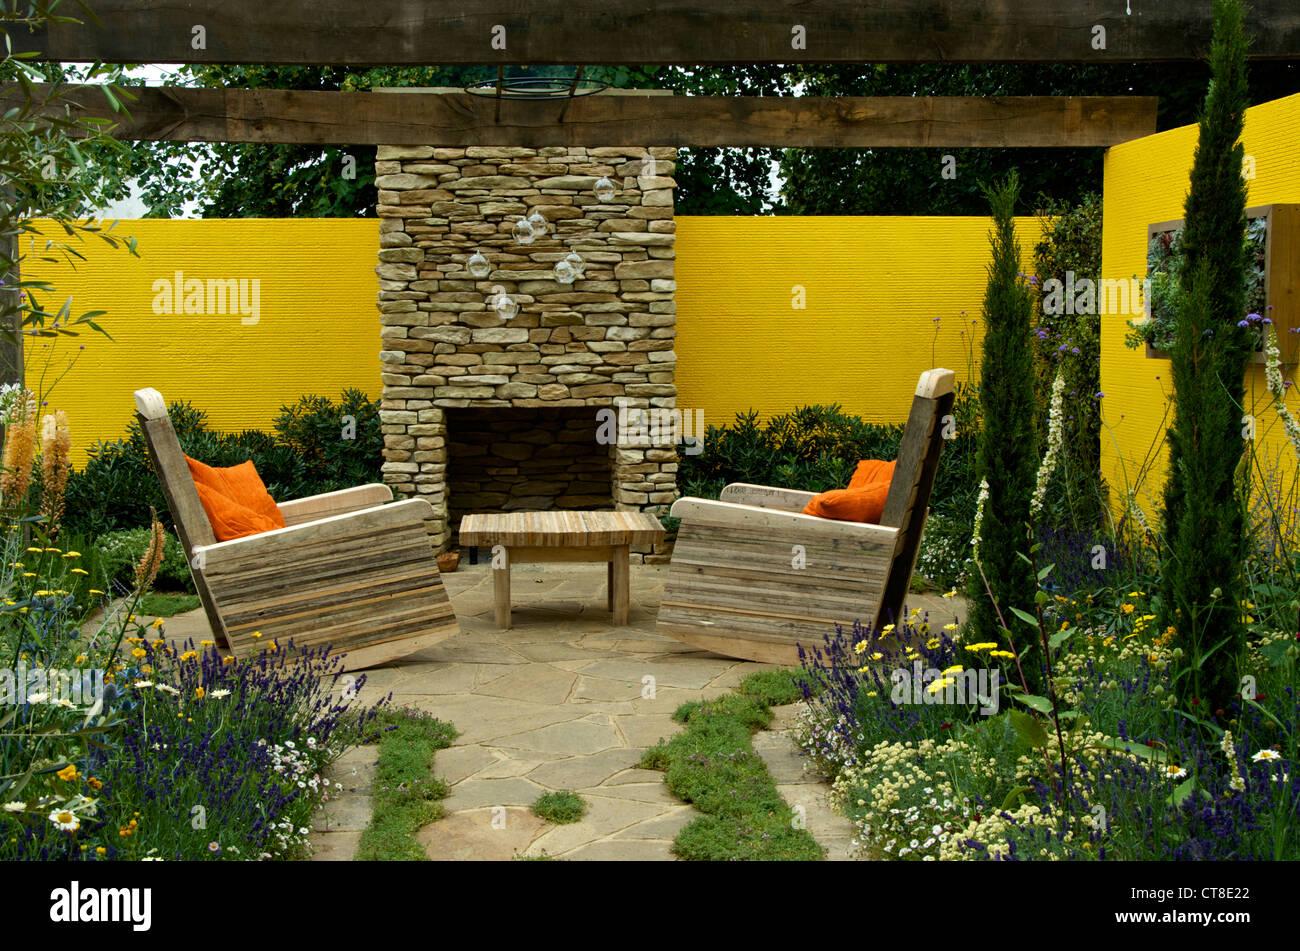 pergola chairs stockfotos pergola chairs bilder alamy. Black Bedroom Furniture Sets. Home Design Ideas